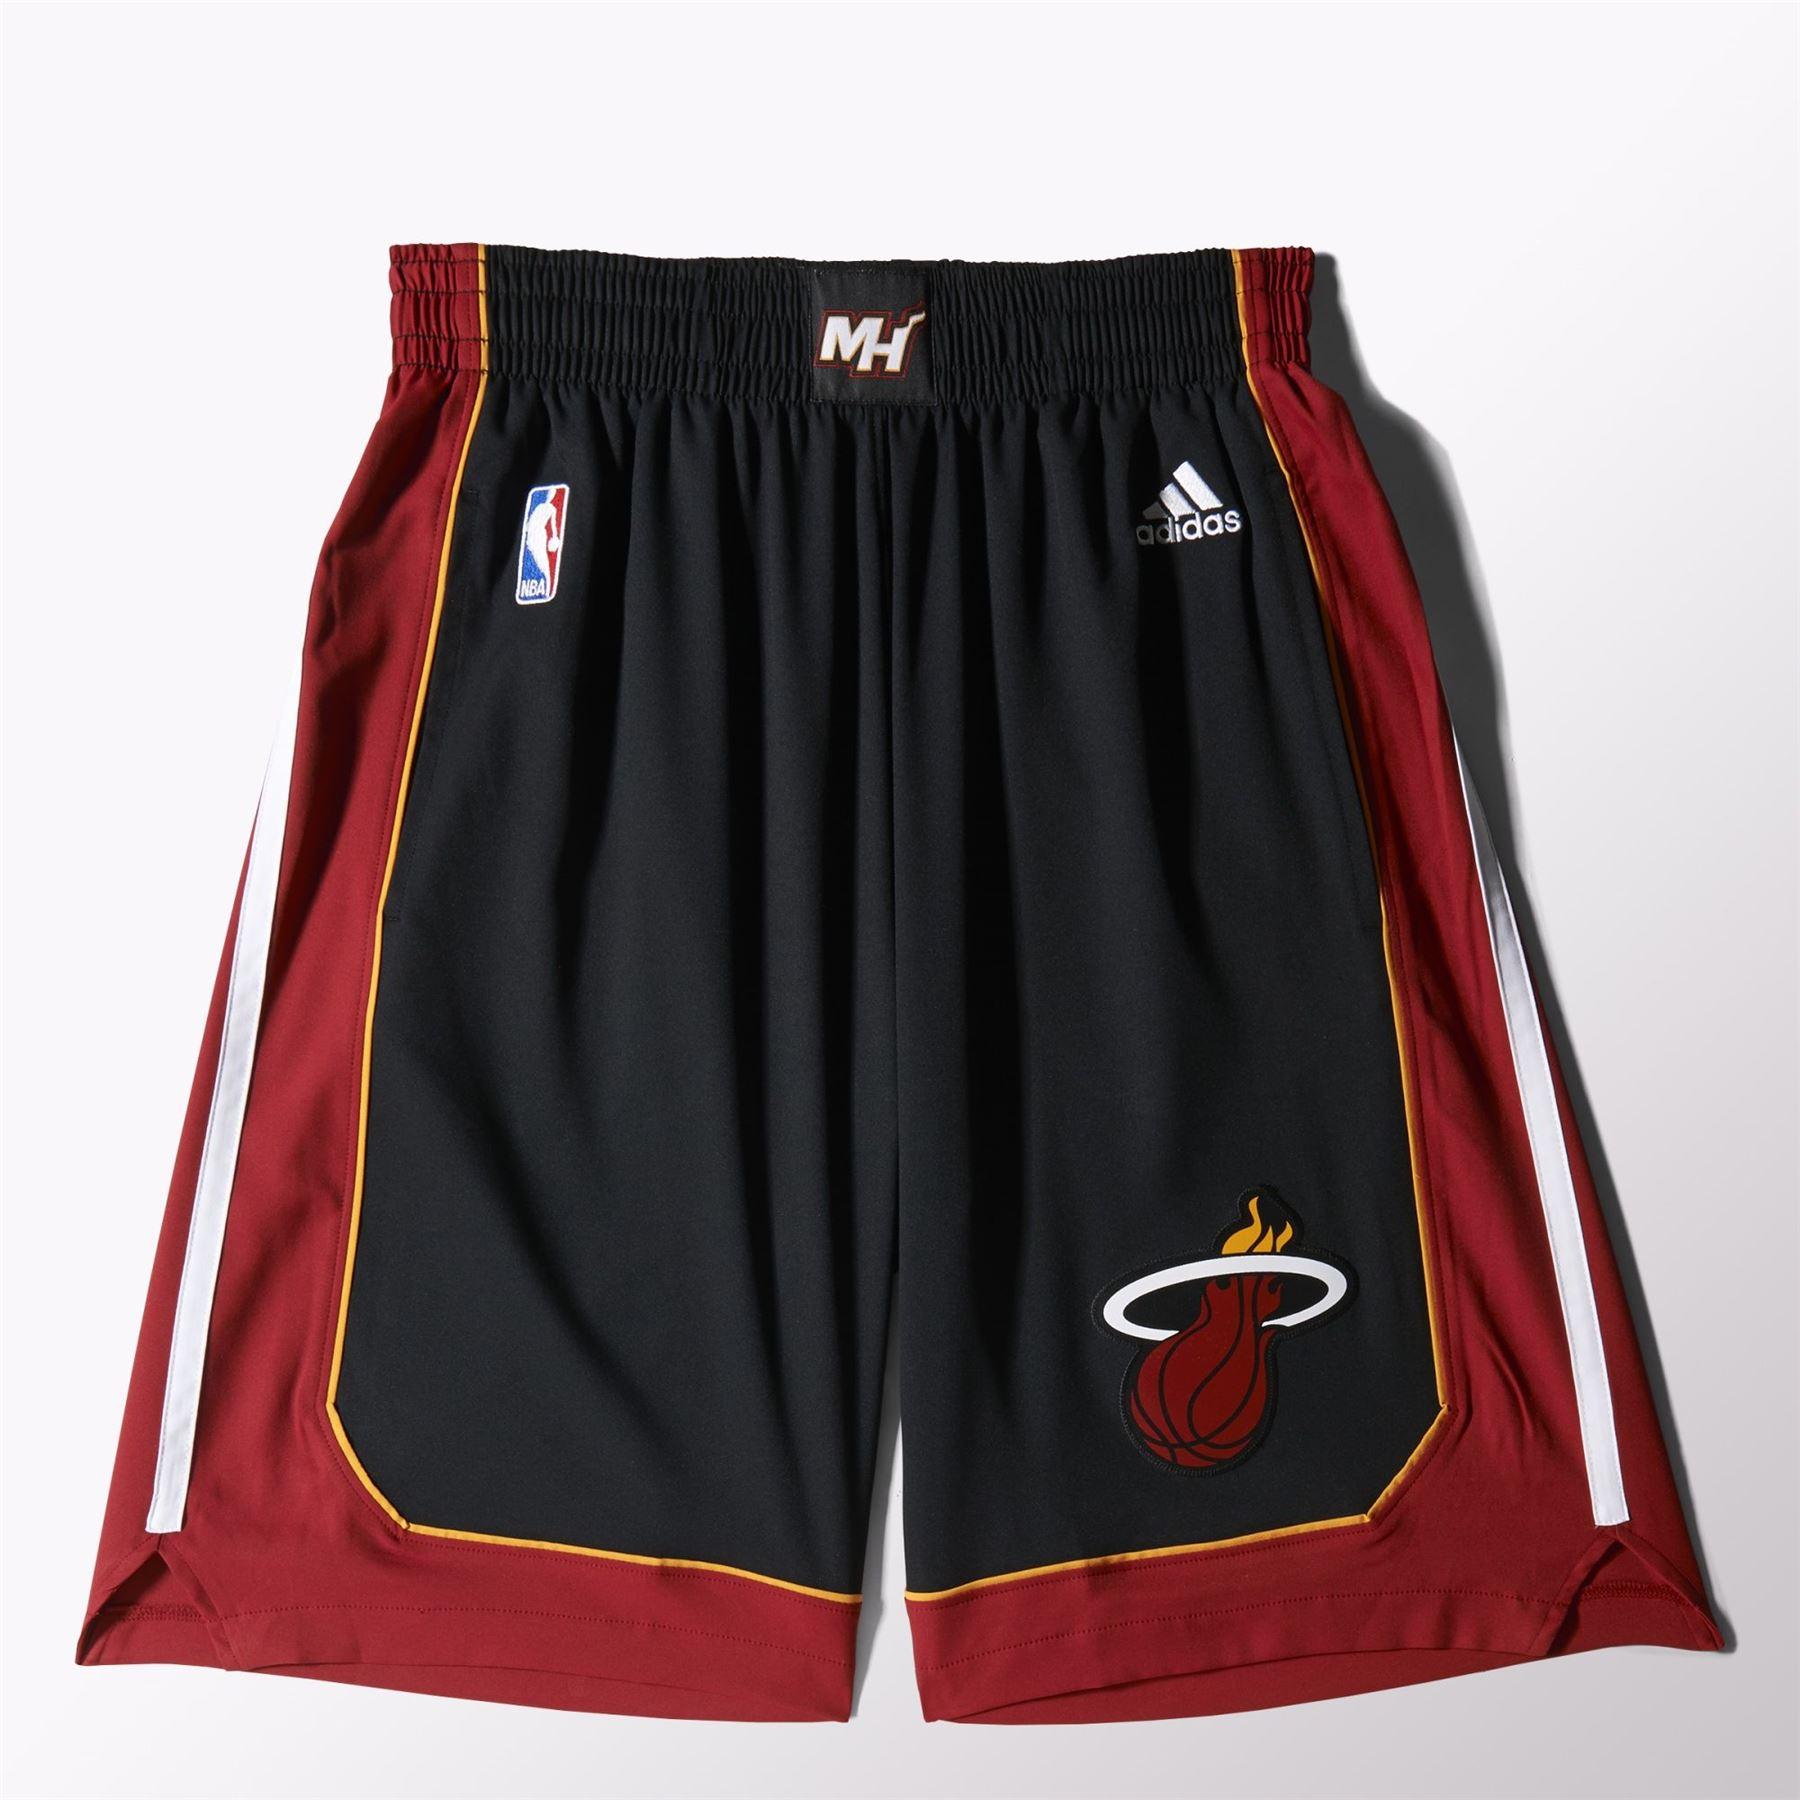 Detalles de Adidas Miami Heat International NBA 1.sports Pantalón Corto Negro Baloncesto